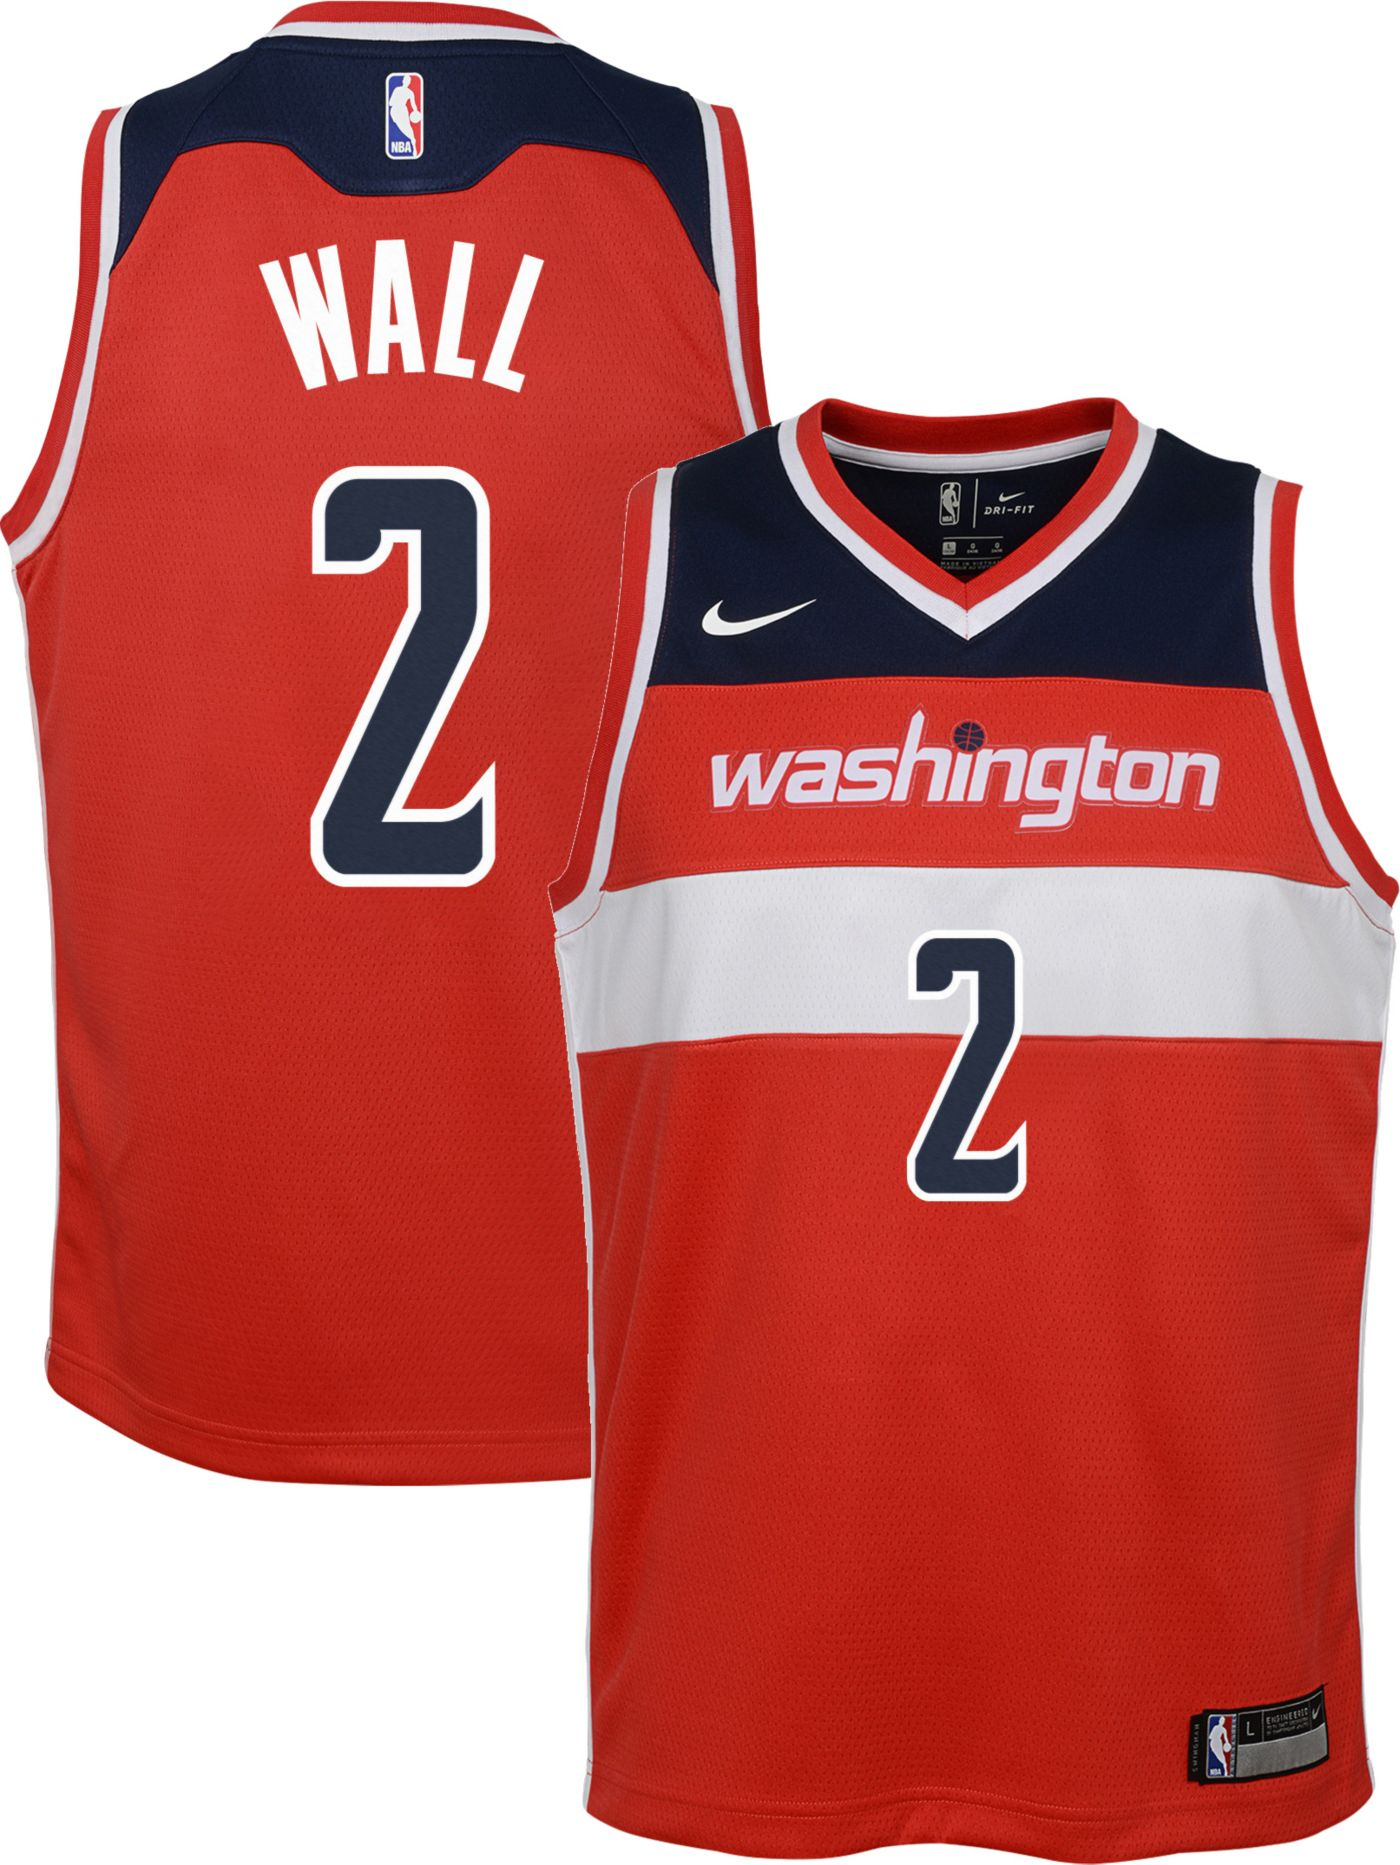 Nike Youth Washington Wizards John Wall #2 Red Dri-FIT Swingman Jersey